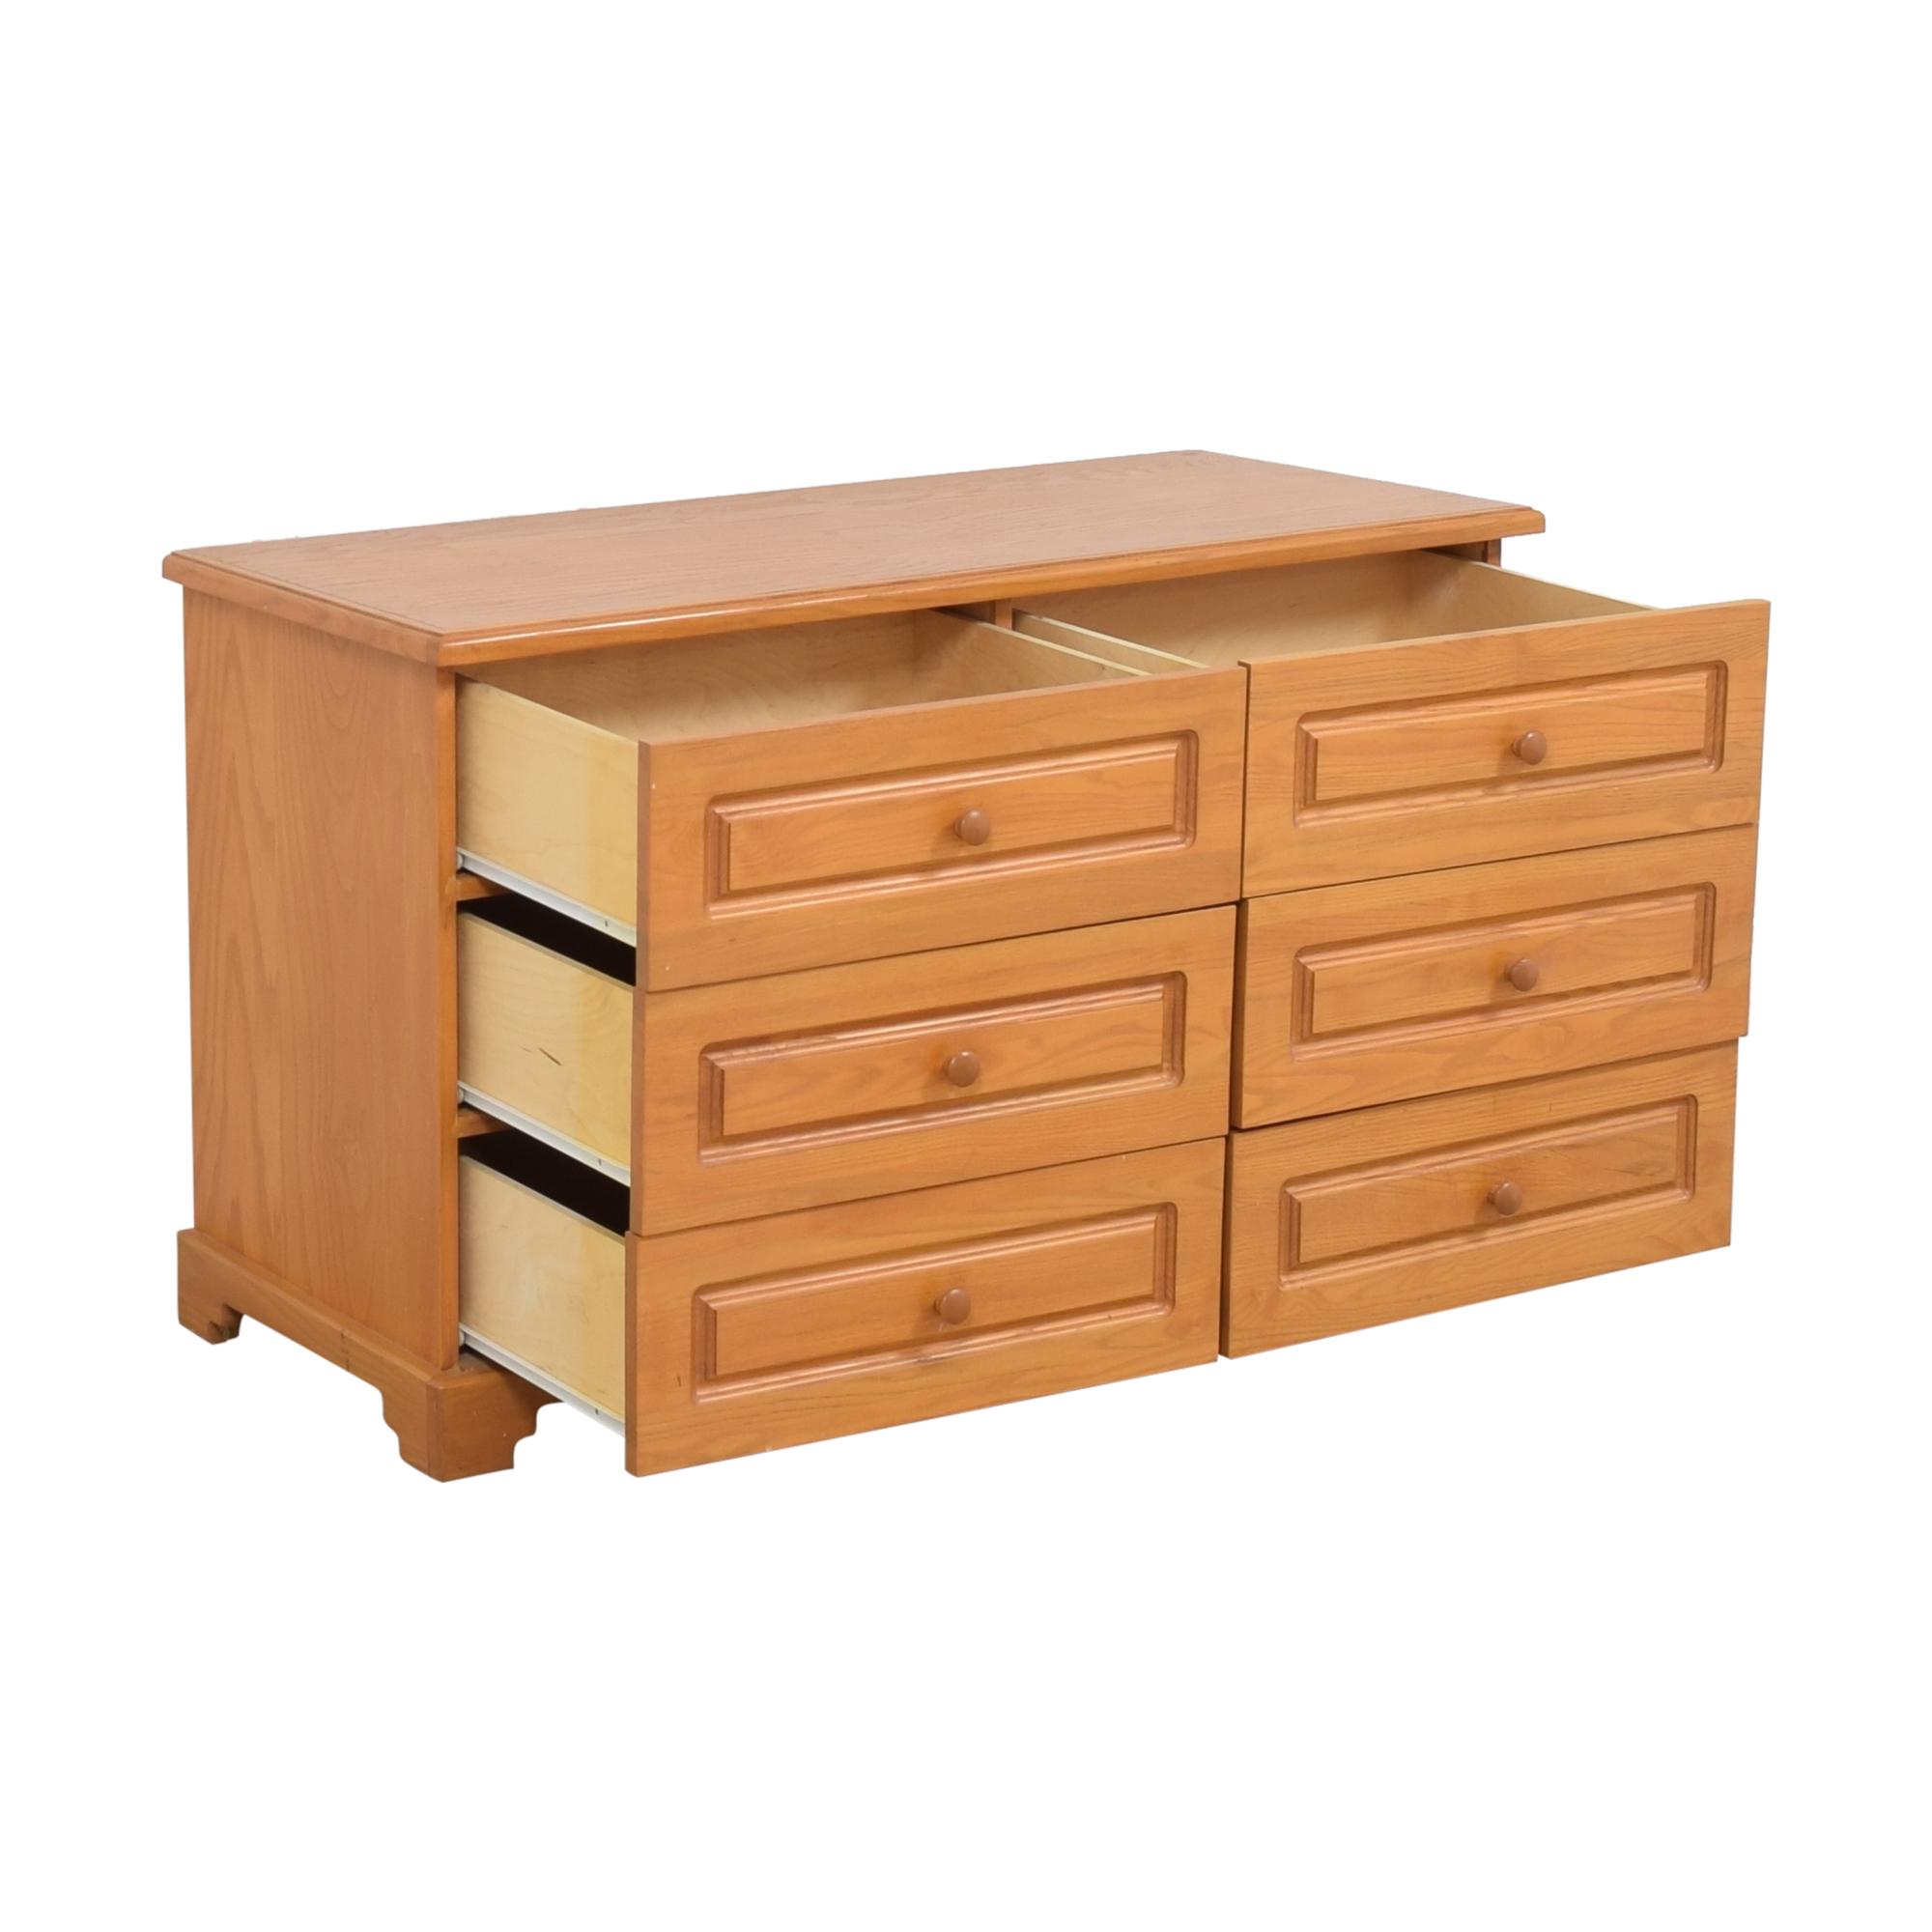 Gothic Cabinet Craft Gothic Cabinet Craft Double Dresser dimensions